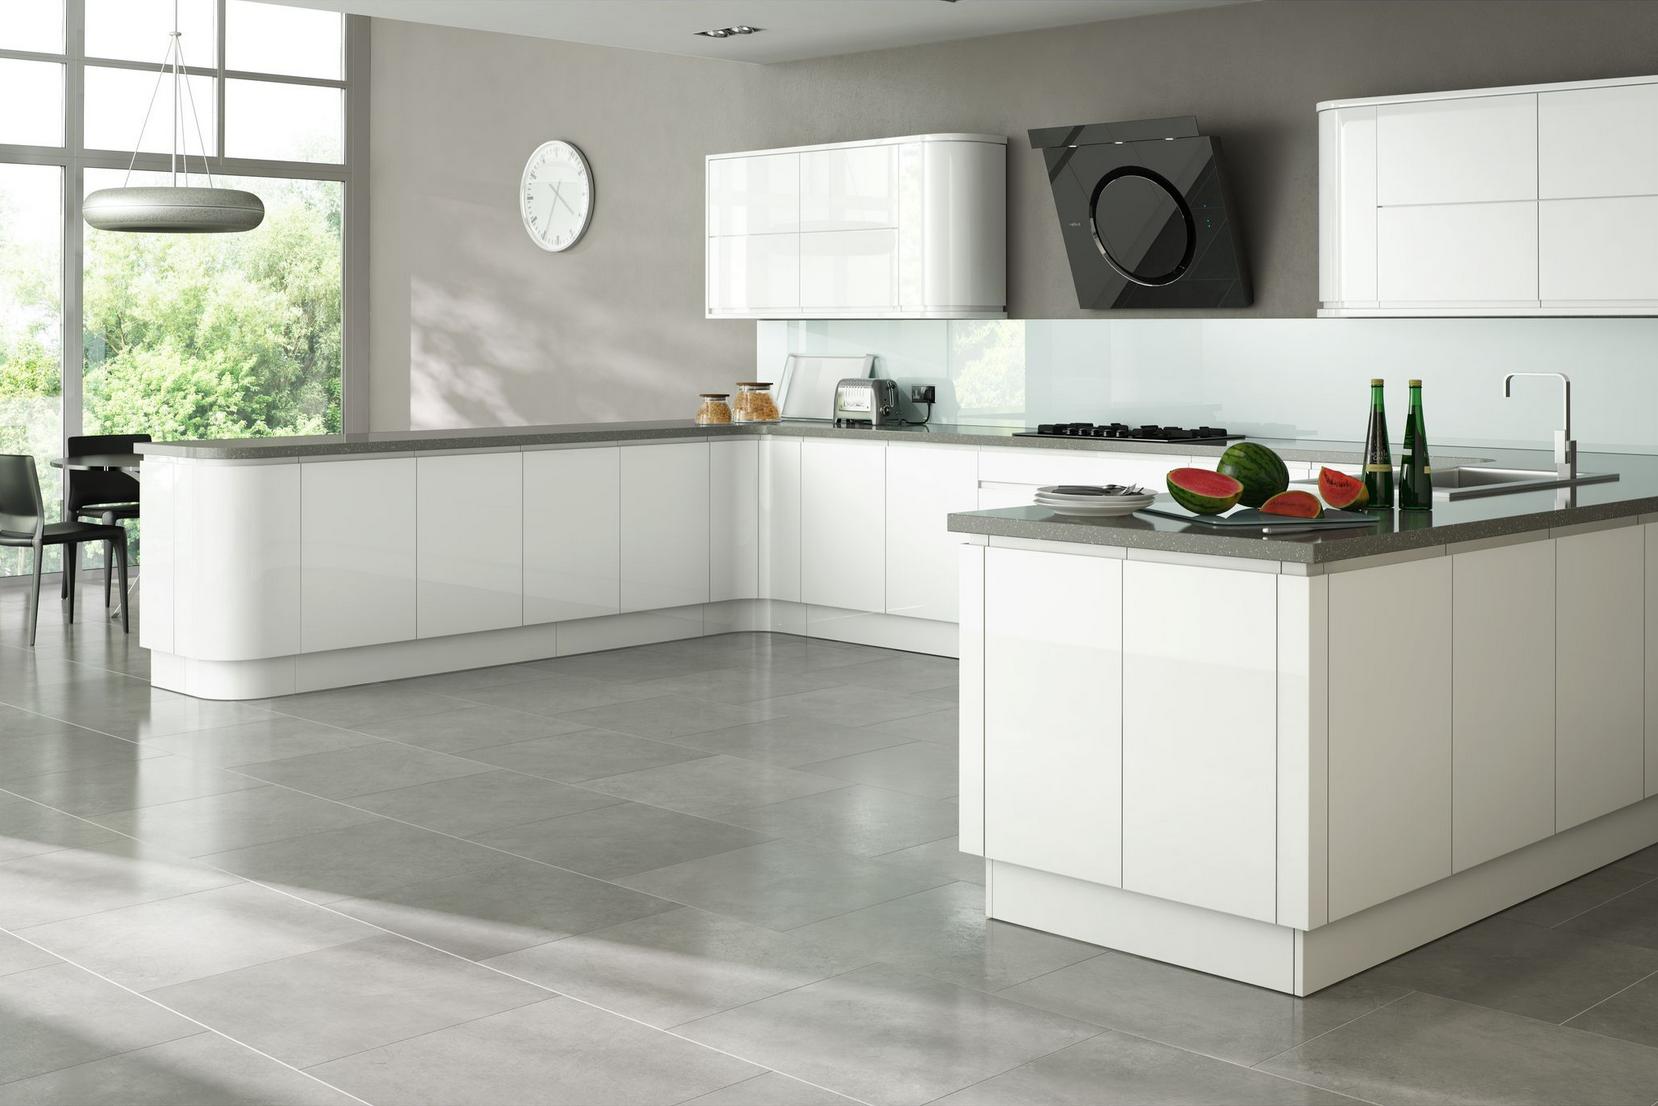 Inspirational Kitchen Cabinet Doors White Gloss White Gloss Kitchen White Kitchen Units Gloss Kitchen